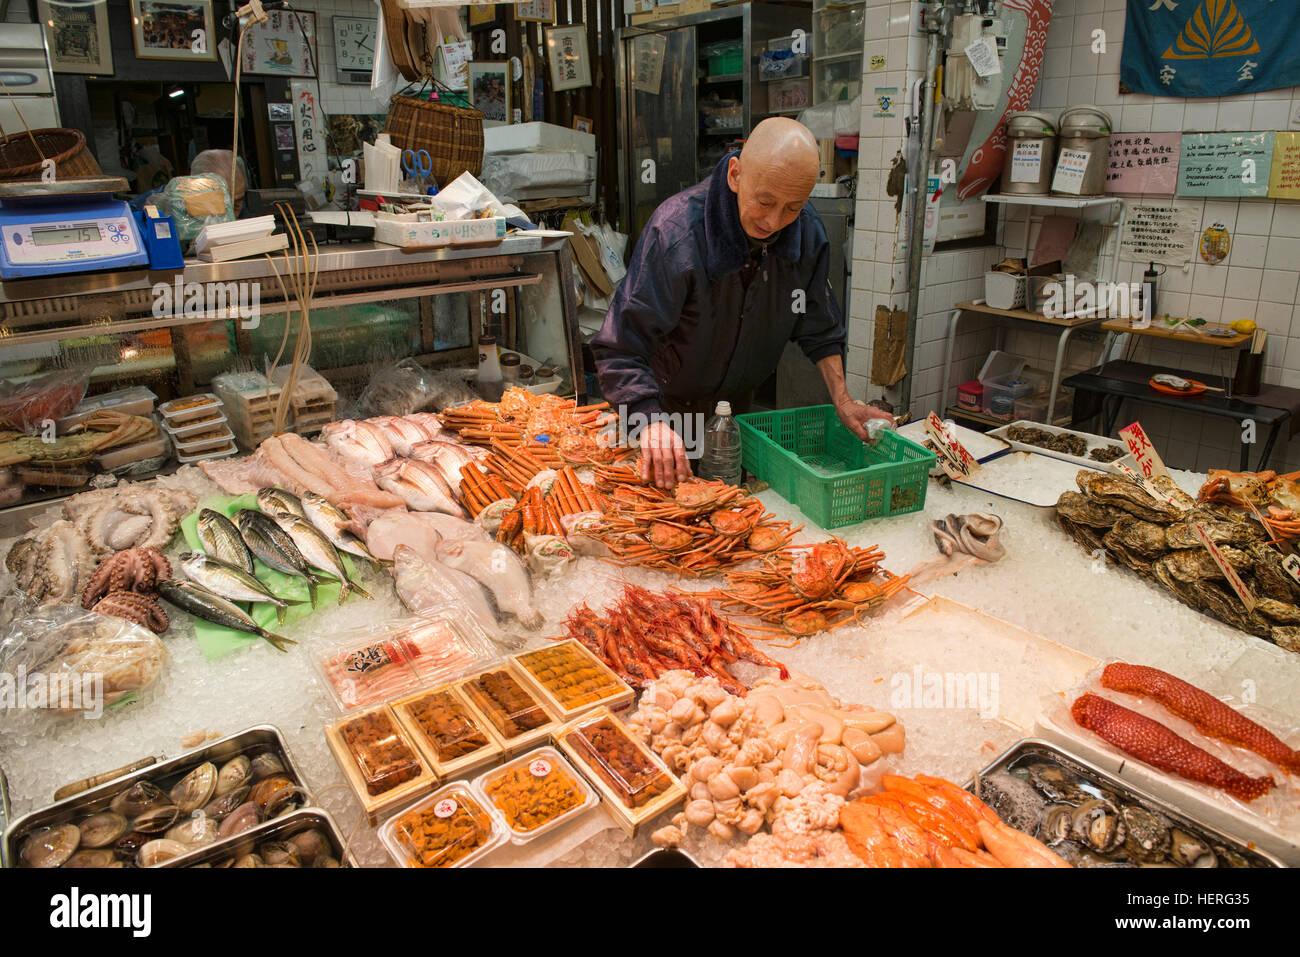 Seafood seller in Nishiki Market, Kyoto, Japan - Stock Image